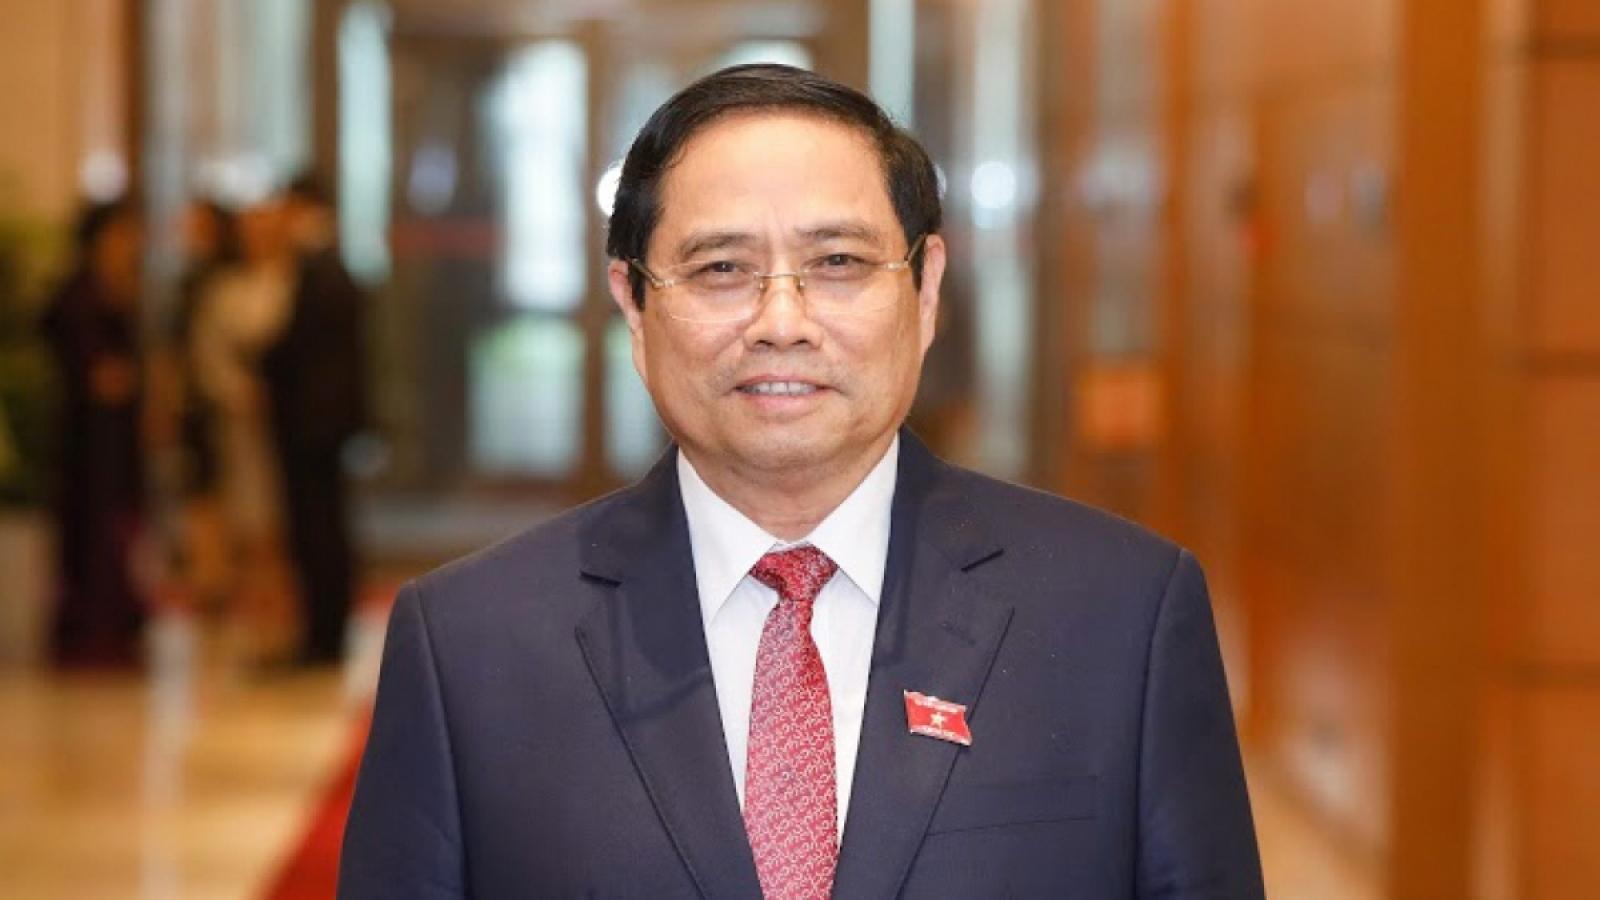 Politburo member Pham Minh Chinh nominated as new Prime Minister